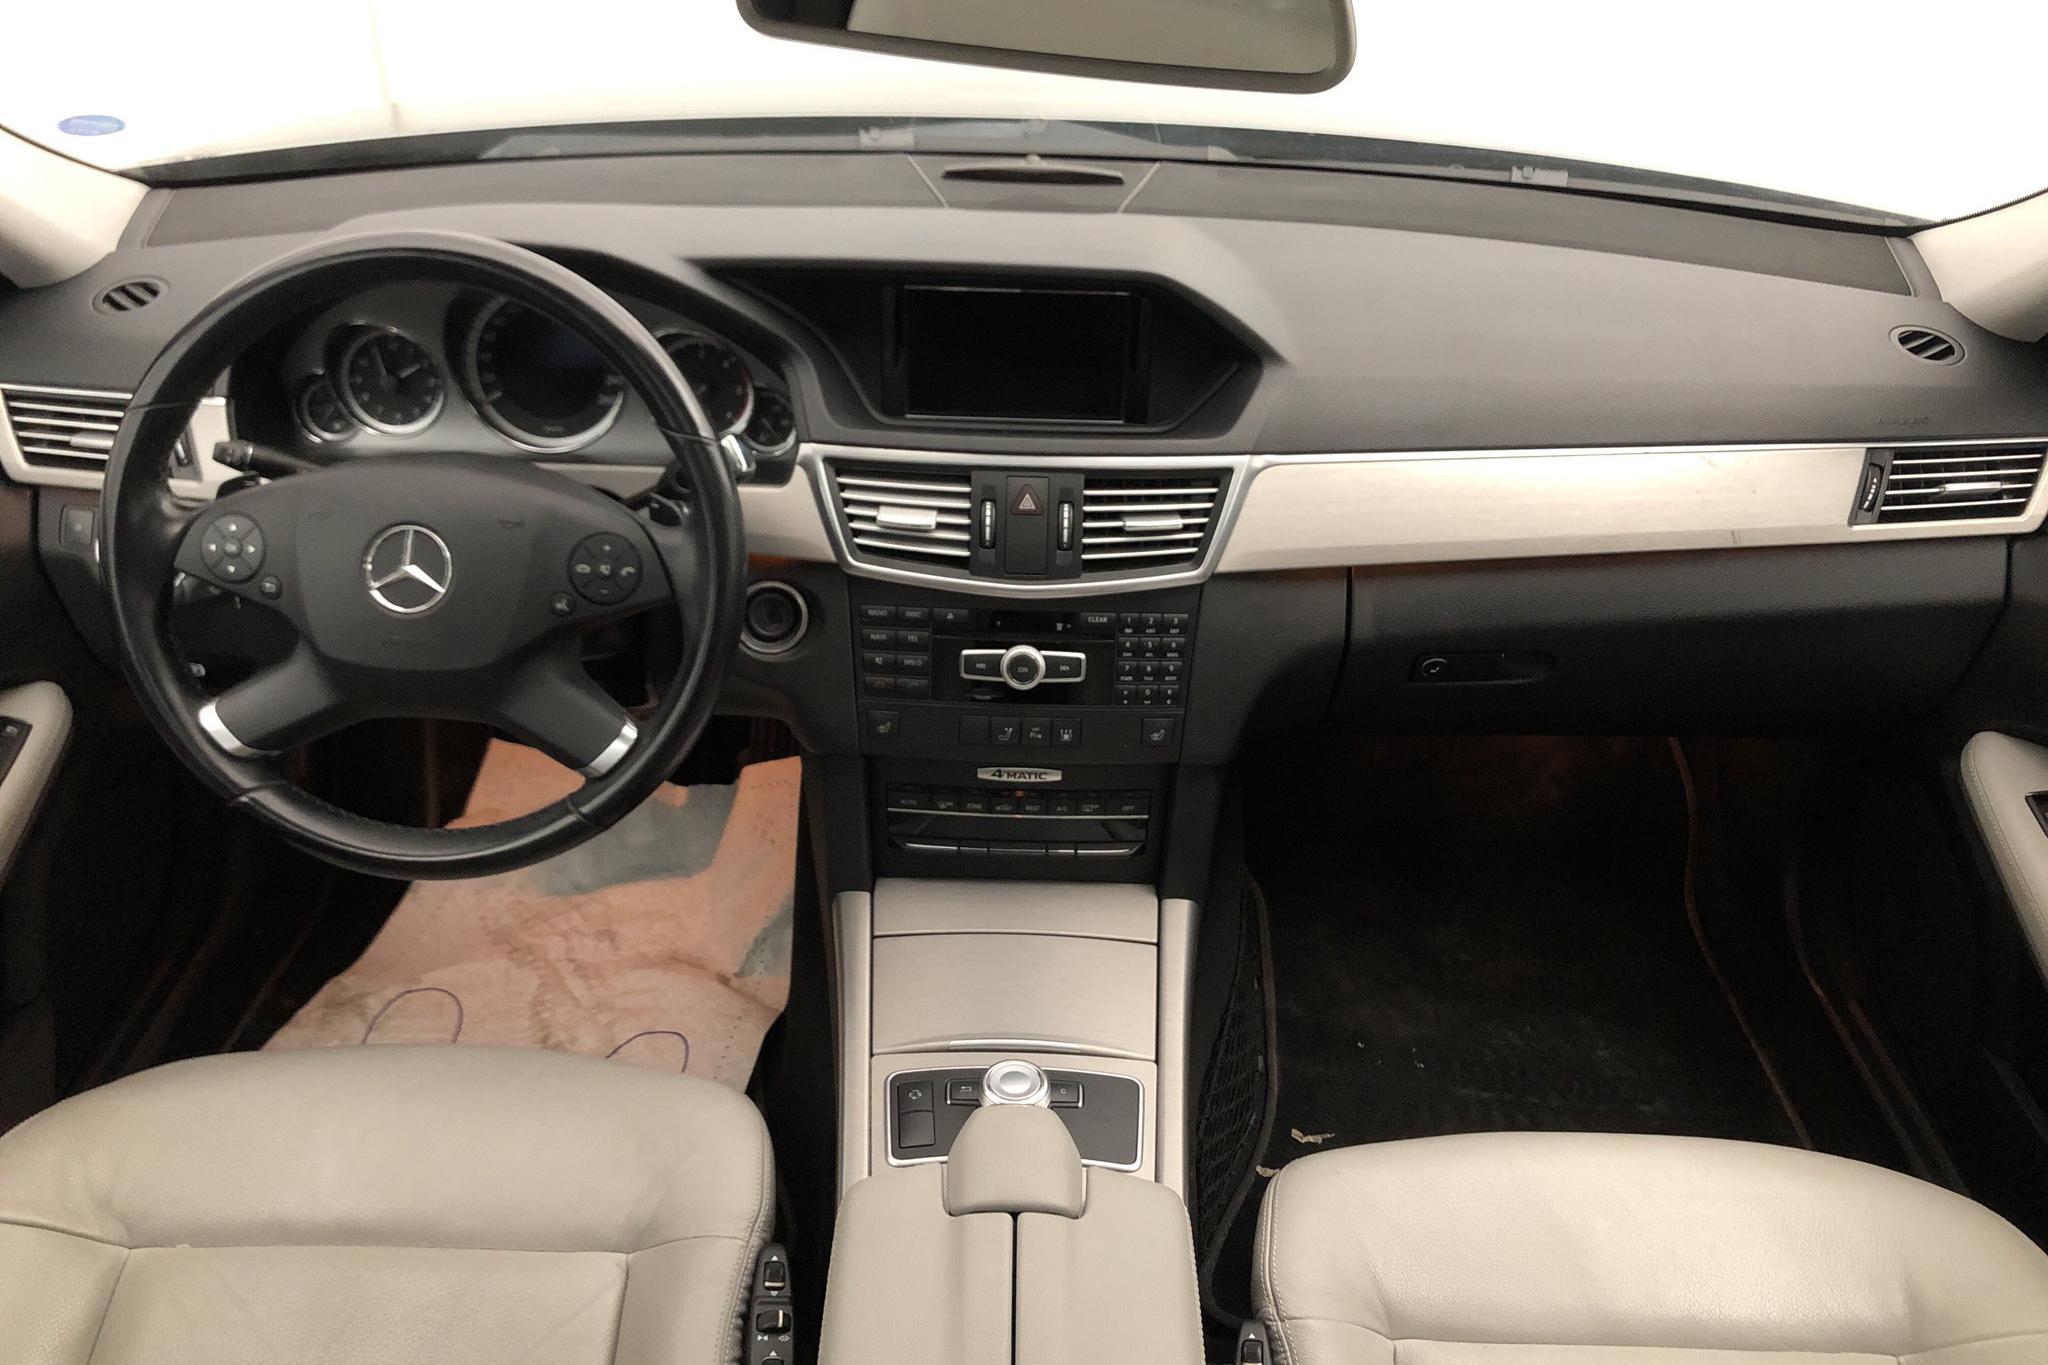 Mercedes E 350 CDI Kombi 4Matic S212 (265hk) - 16 332 mil - Automat - grå - 2012